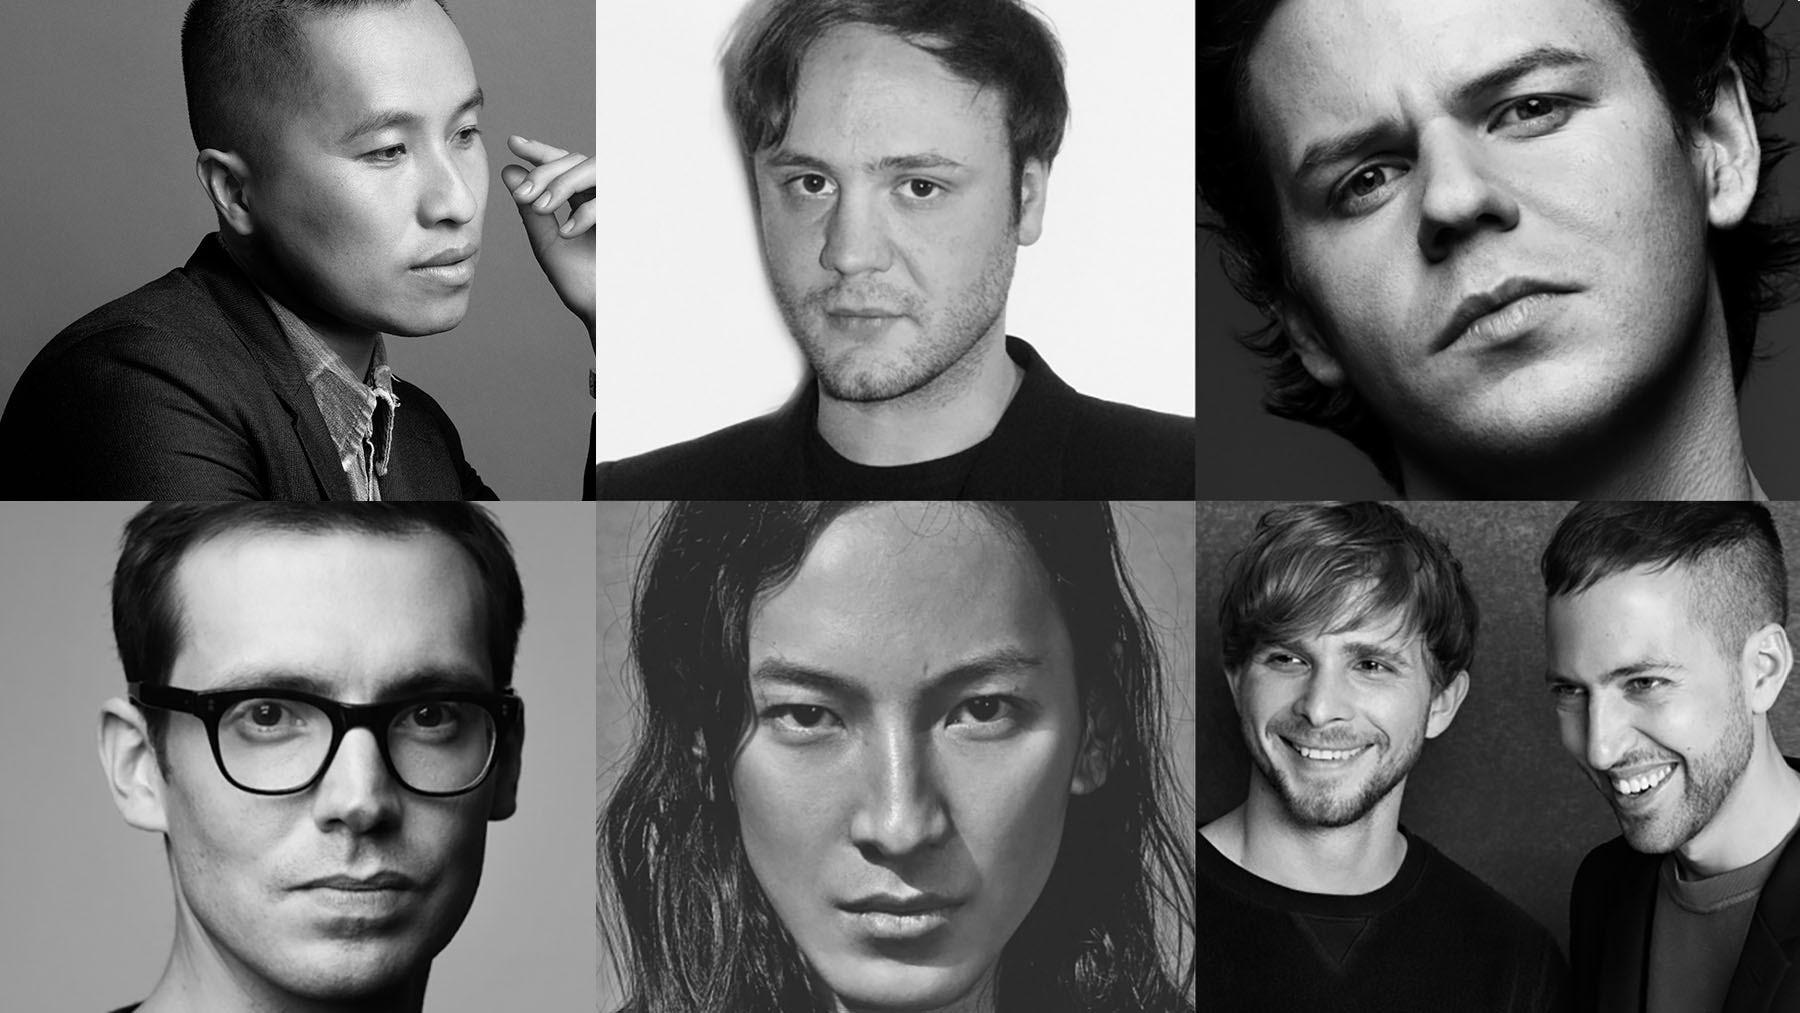 From left: Phillip Lim, Nicholas Kirkwood, Christopher Kane, Erdem Moralioglu, Alexander Wang, Peter Pilotto and Christopher de Vos | Source: Courtesy